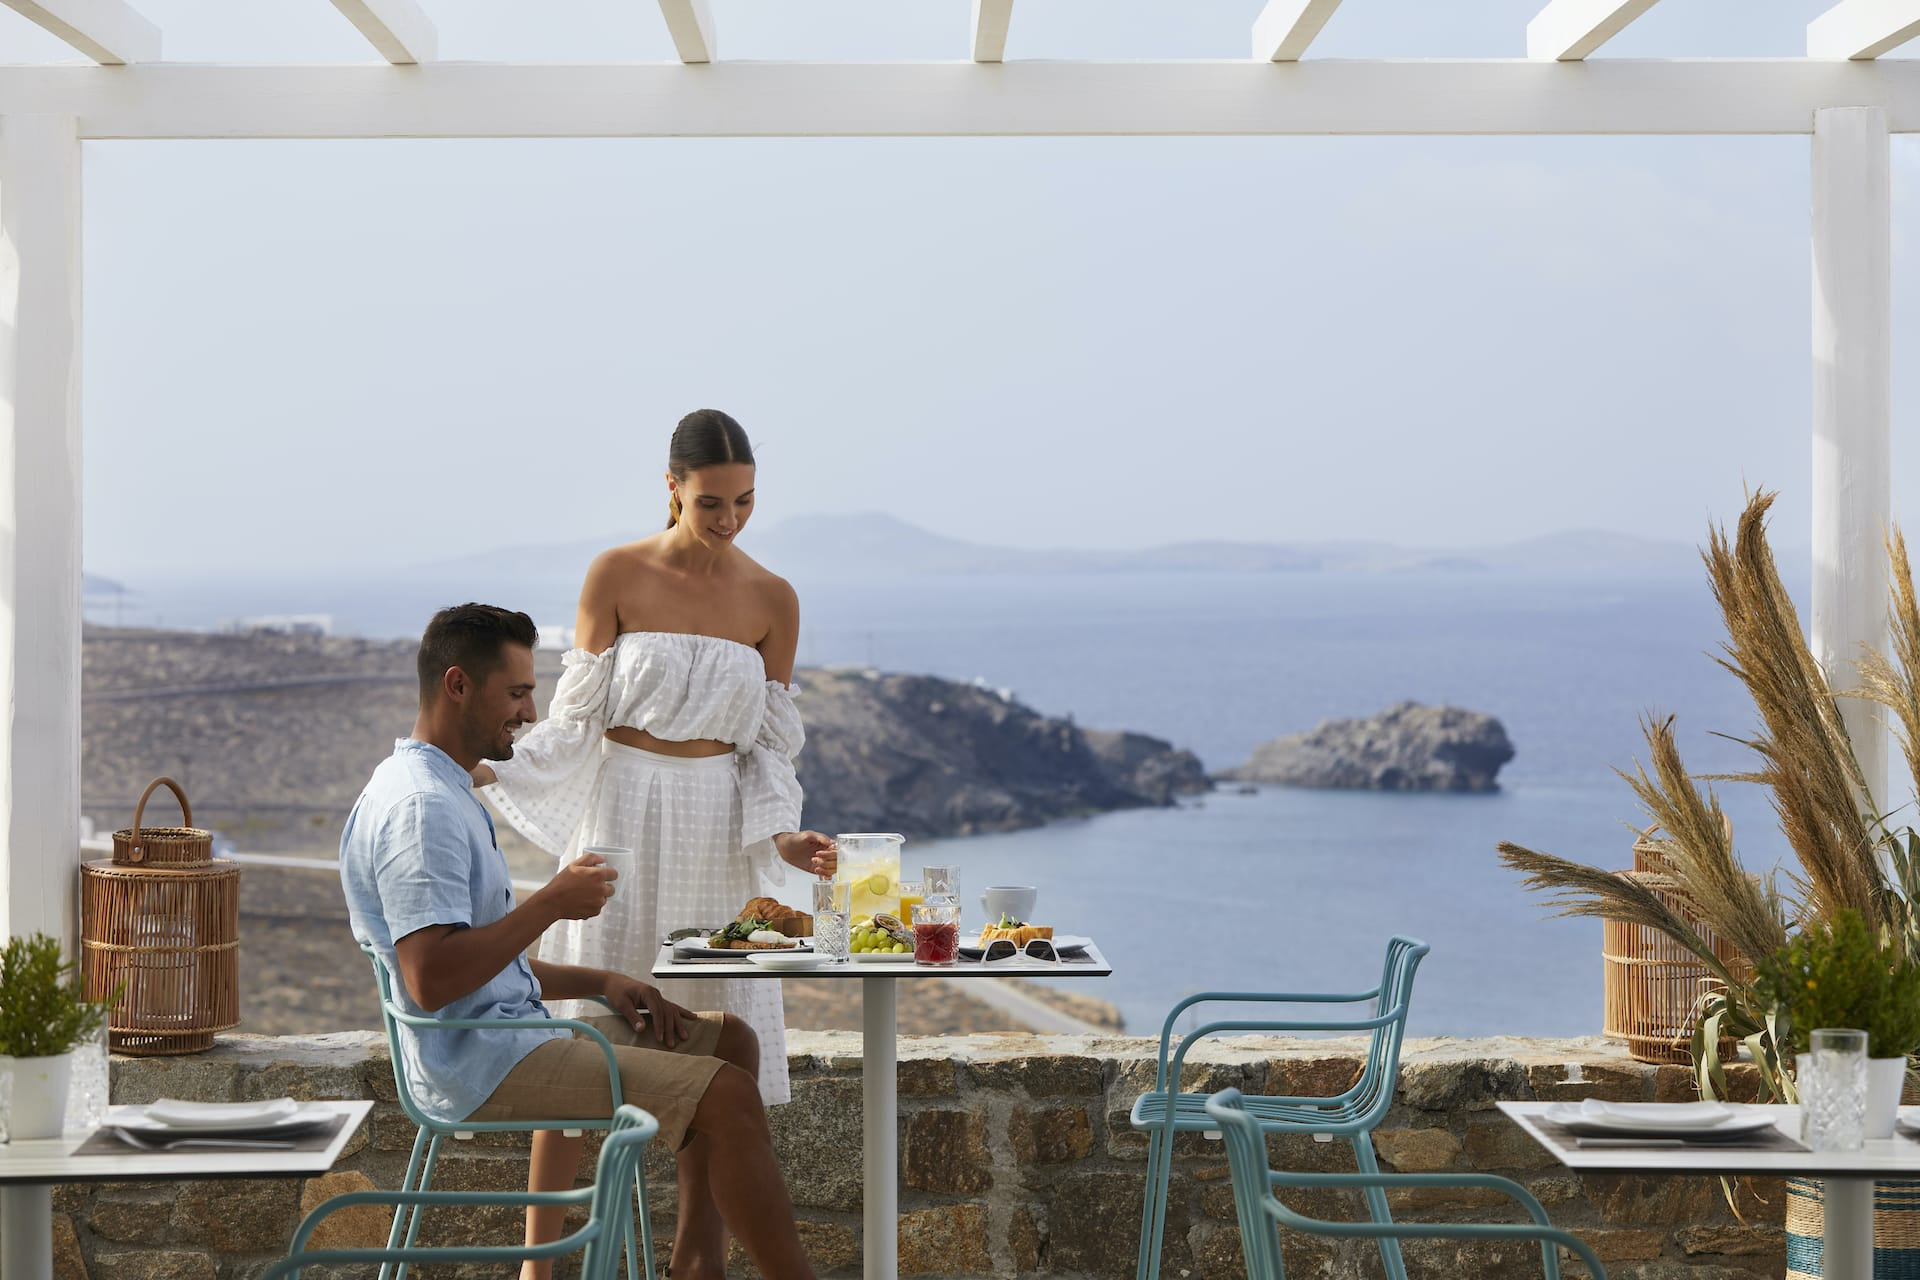 Couple enjoying their breakfast at the Epic Blue Mykonos hotel. Woman serving man juice.